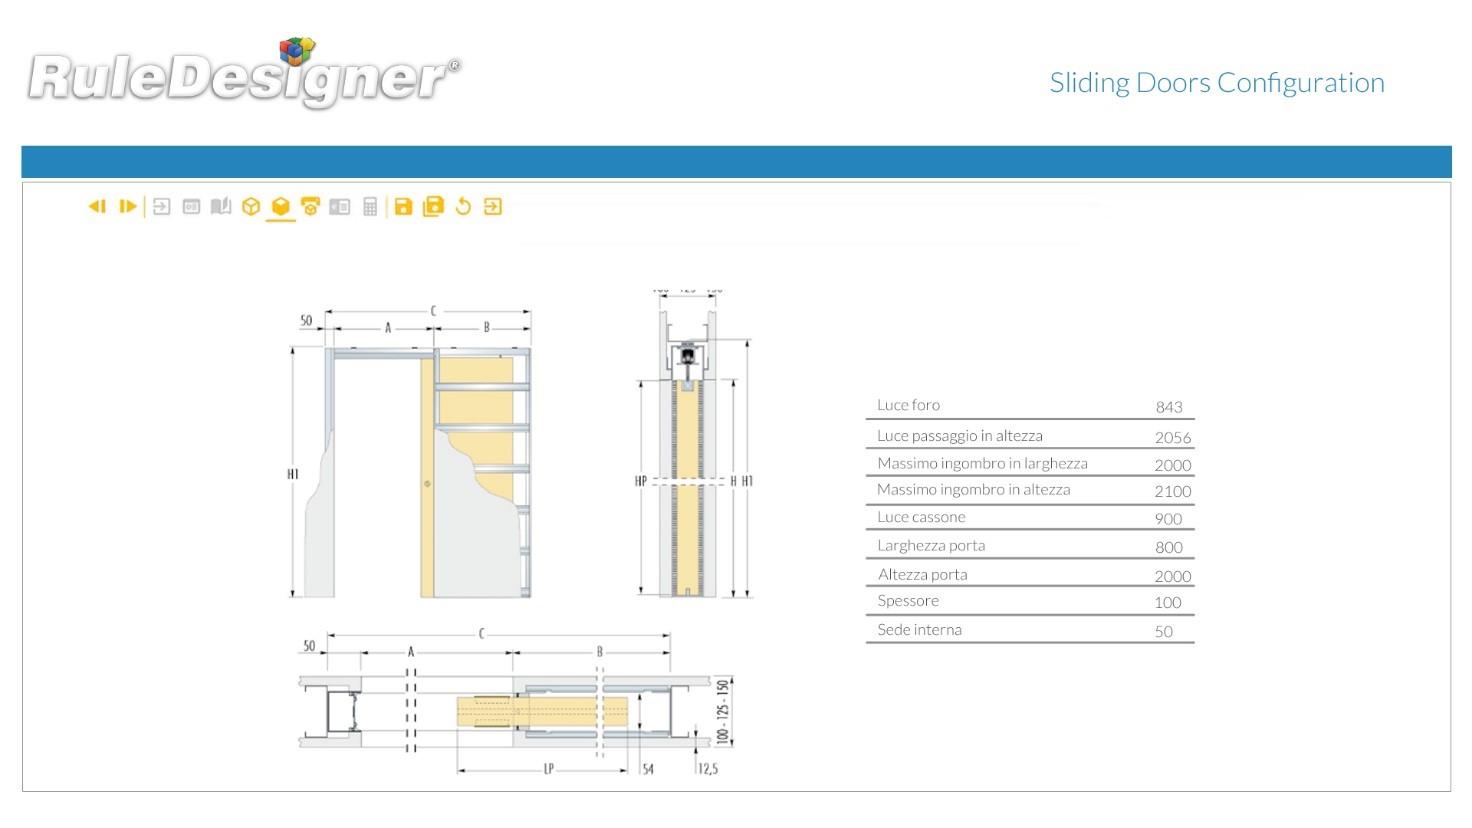 SlidingDoorsConfigurations